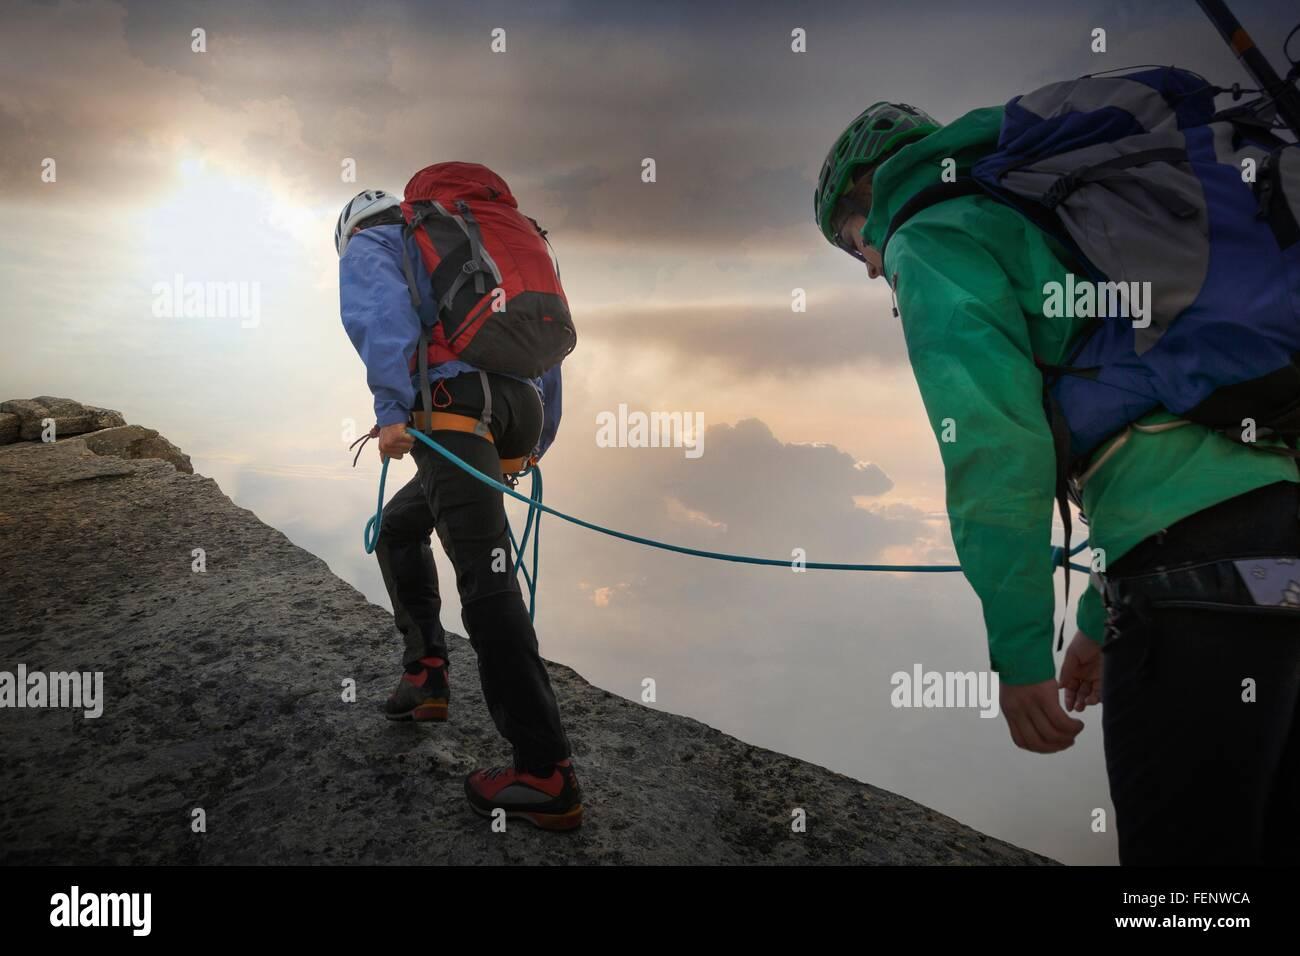 Climbers on mountain ridge, Mont Blanc, France - Stock Image